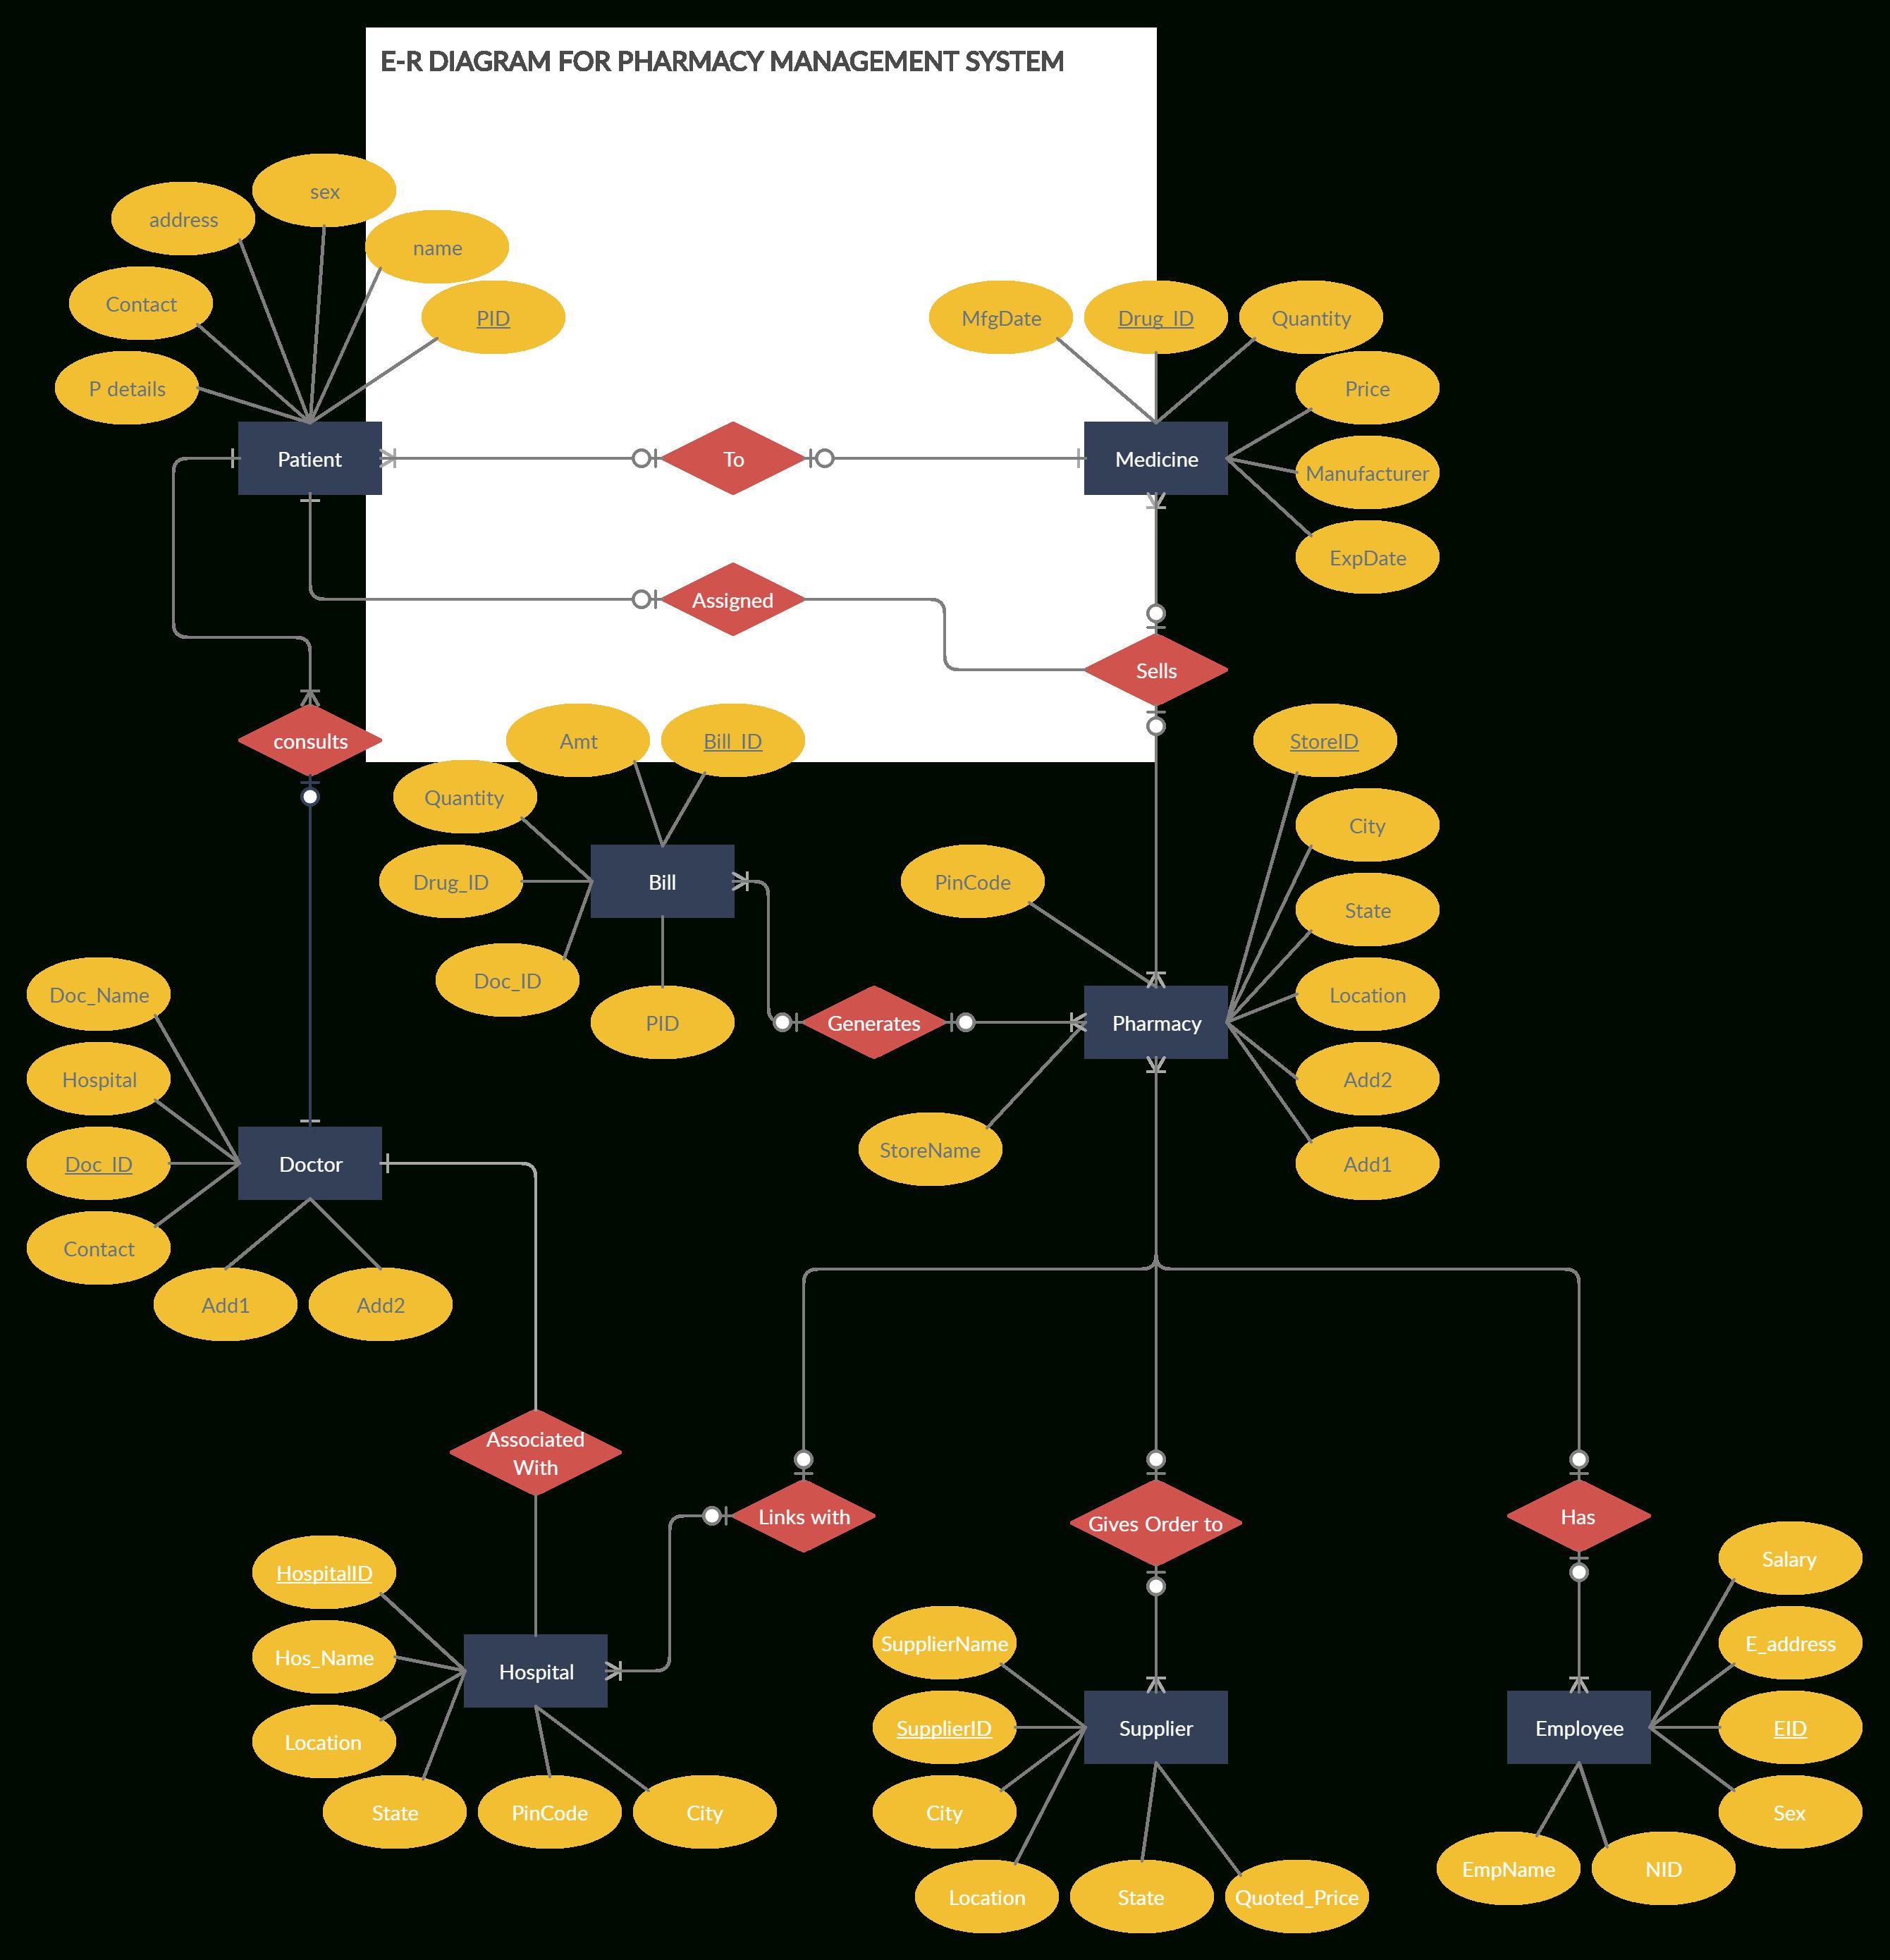 Pharmacy Management System | Relationship Diagram, Pharmacy